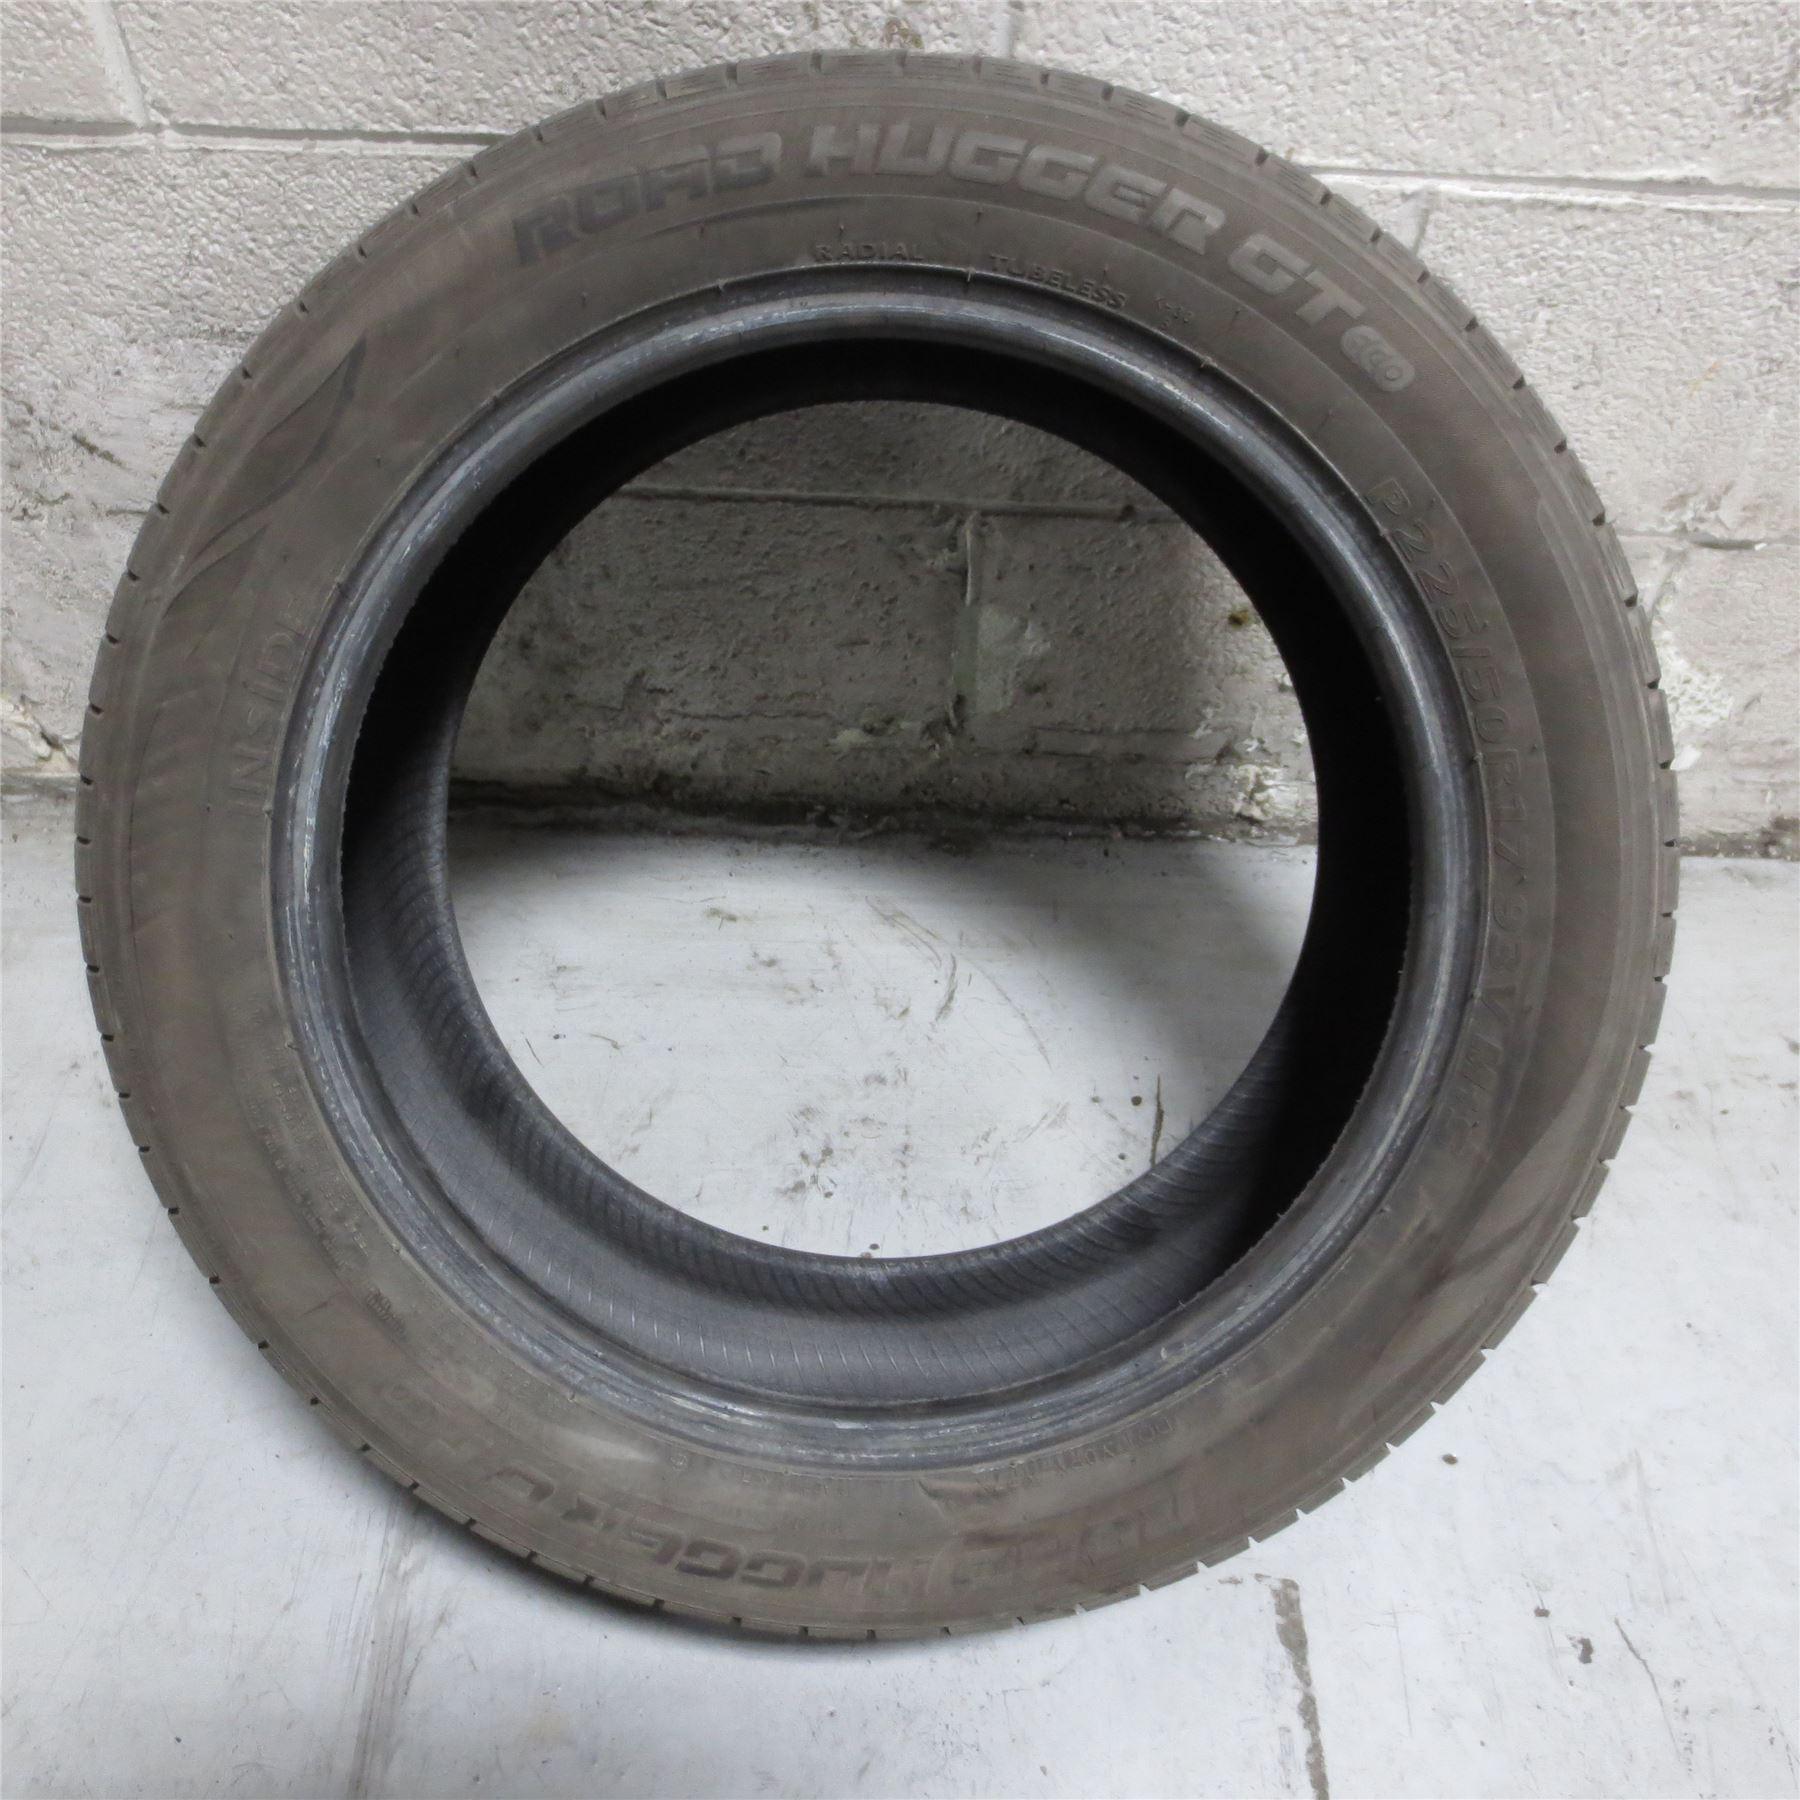 225 50r17 Road Hugger Gt Eco 93v Tire 10 32nd No Repairs Ebay